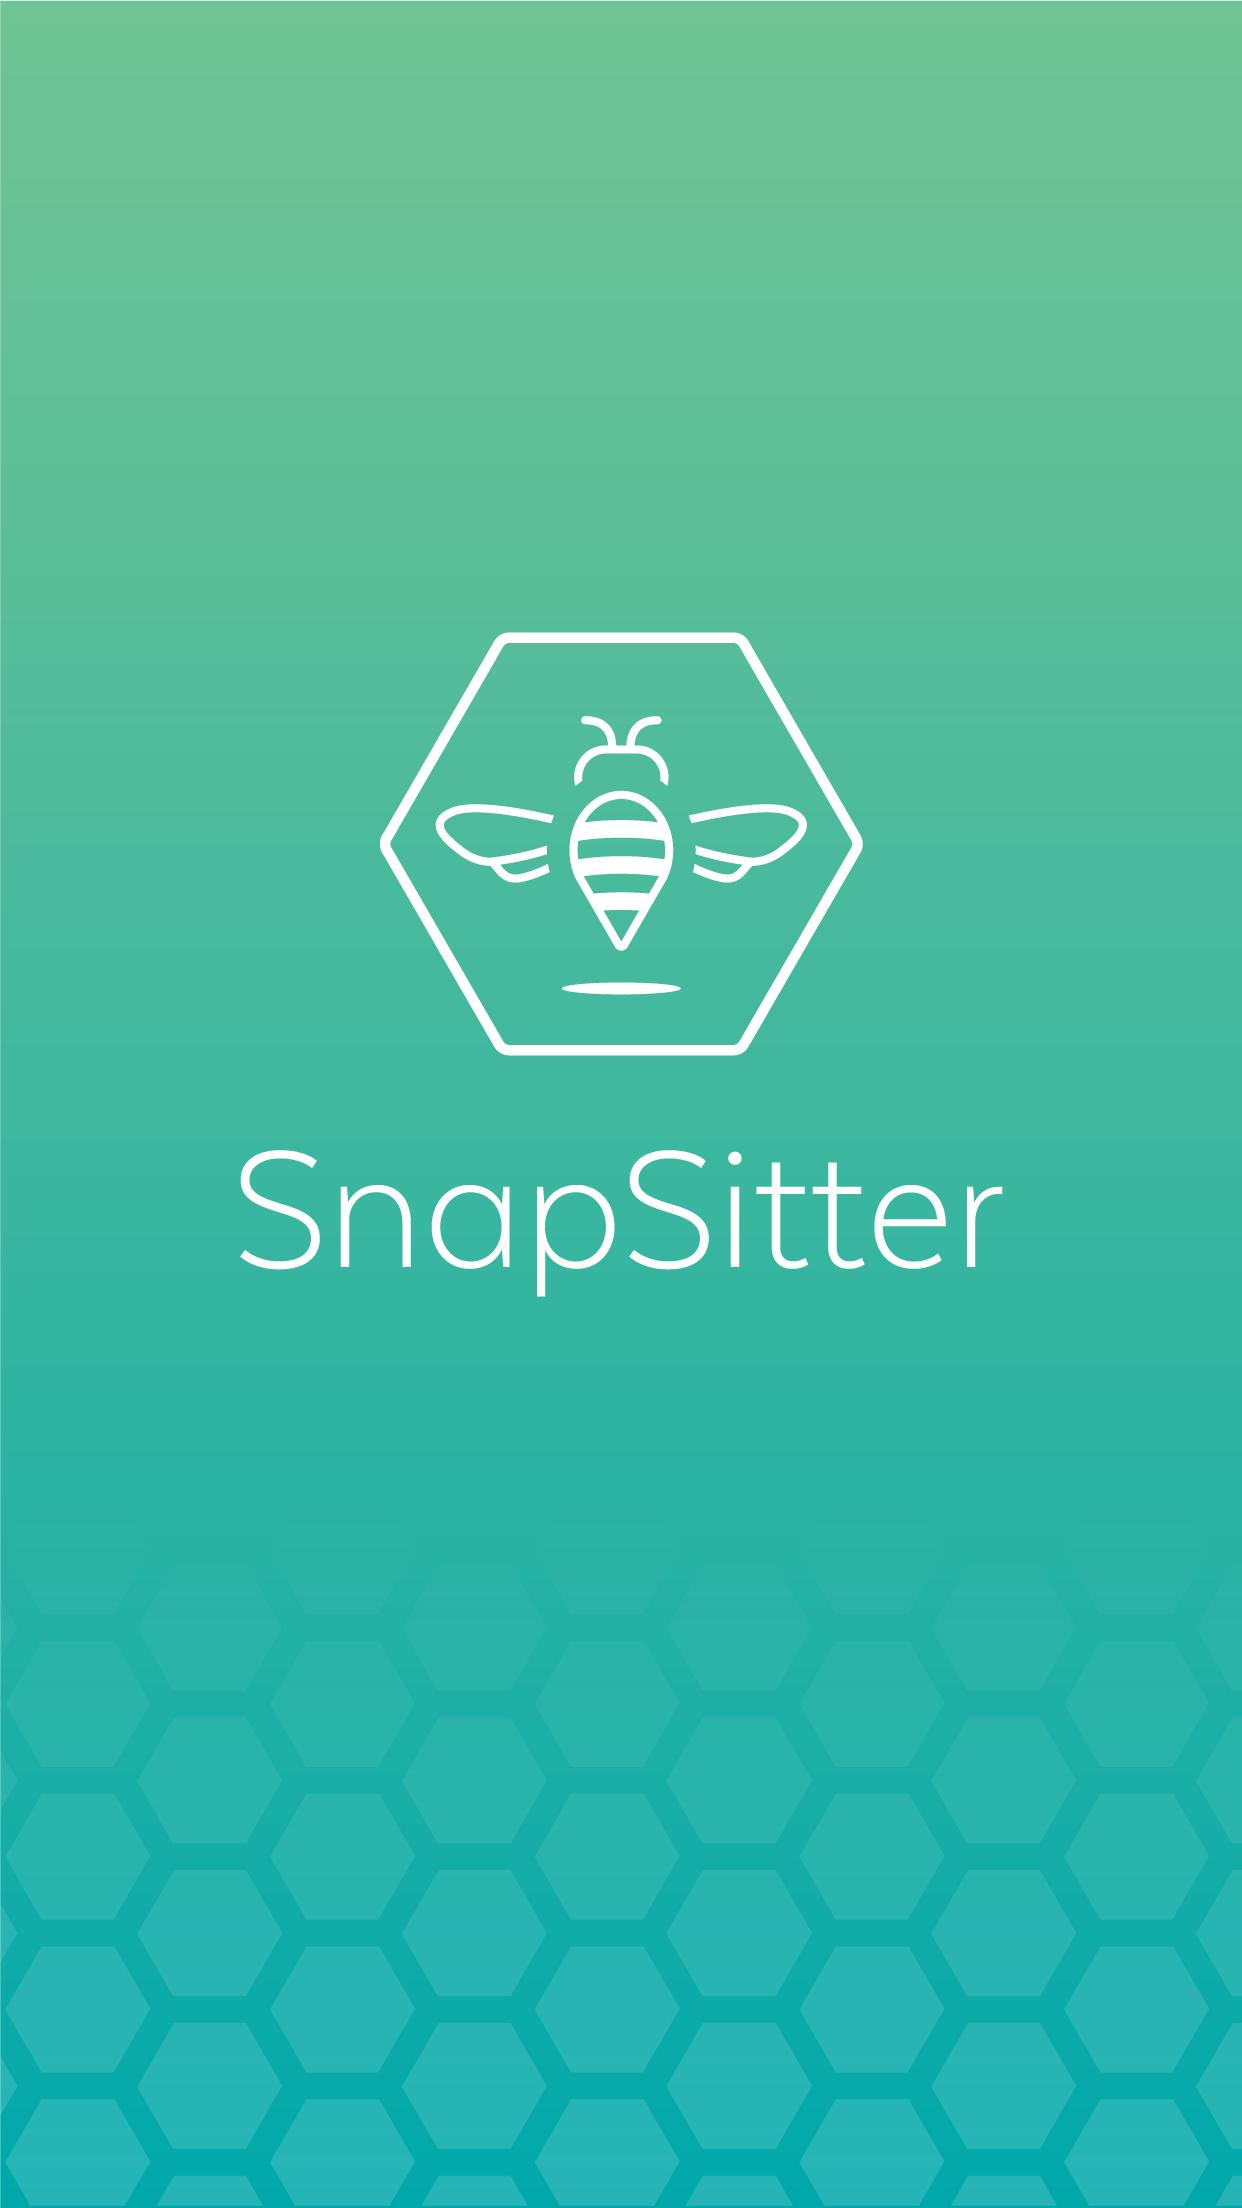 SnapSitter_General_01_MainLogin.png